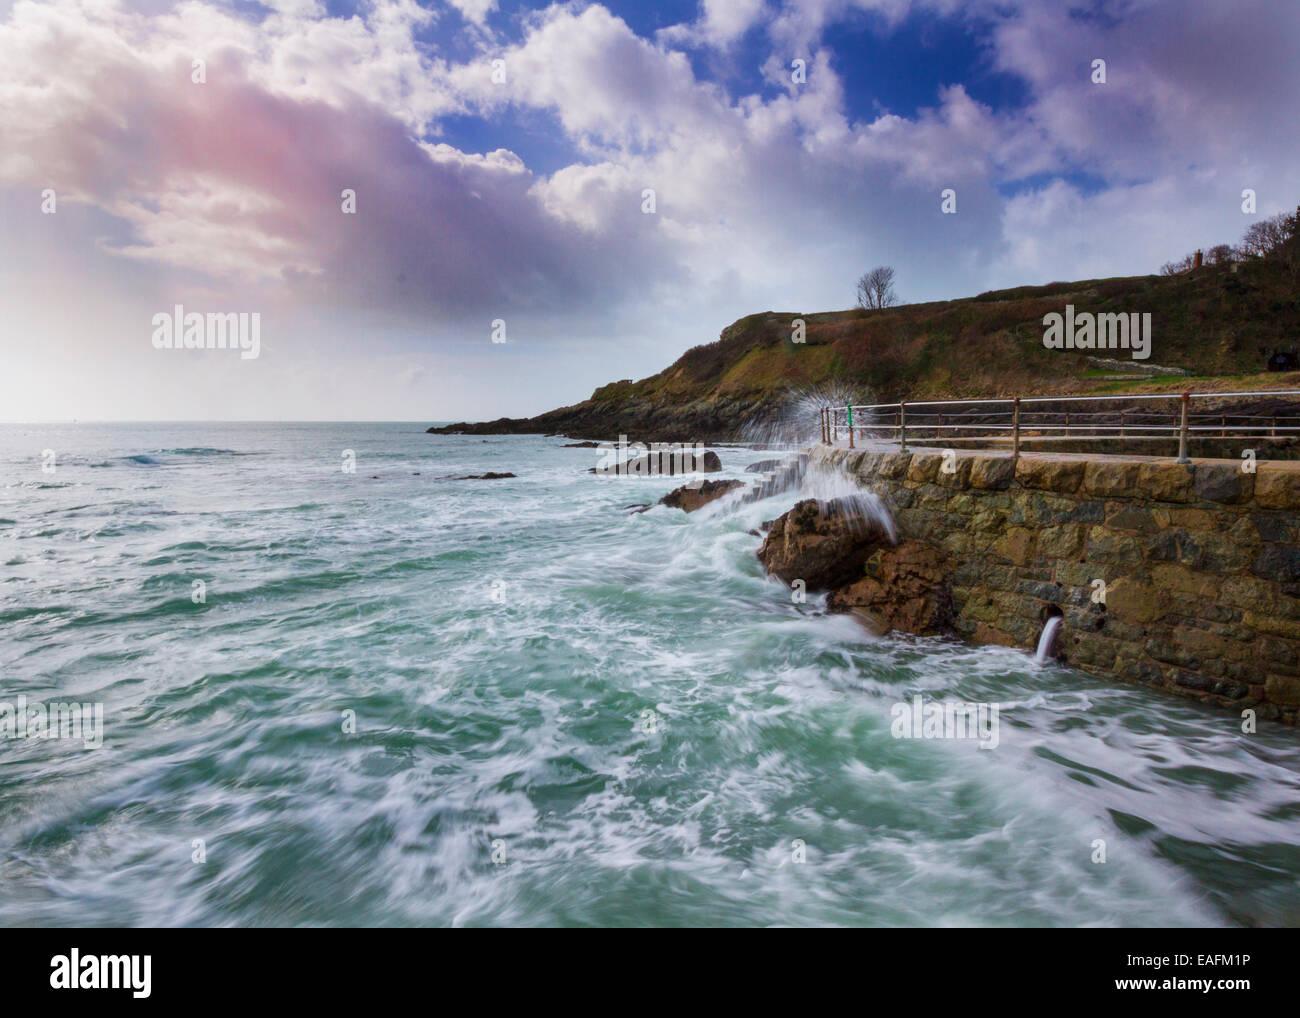 Coastal scene on Guernsey  Channel Islands UK - Stock Image